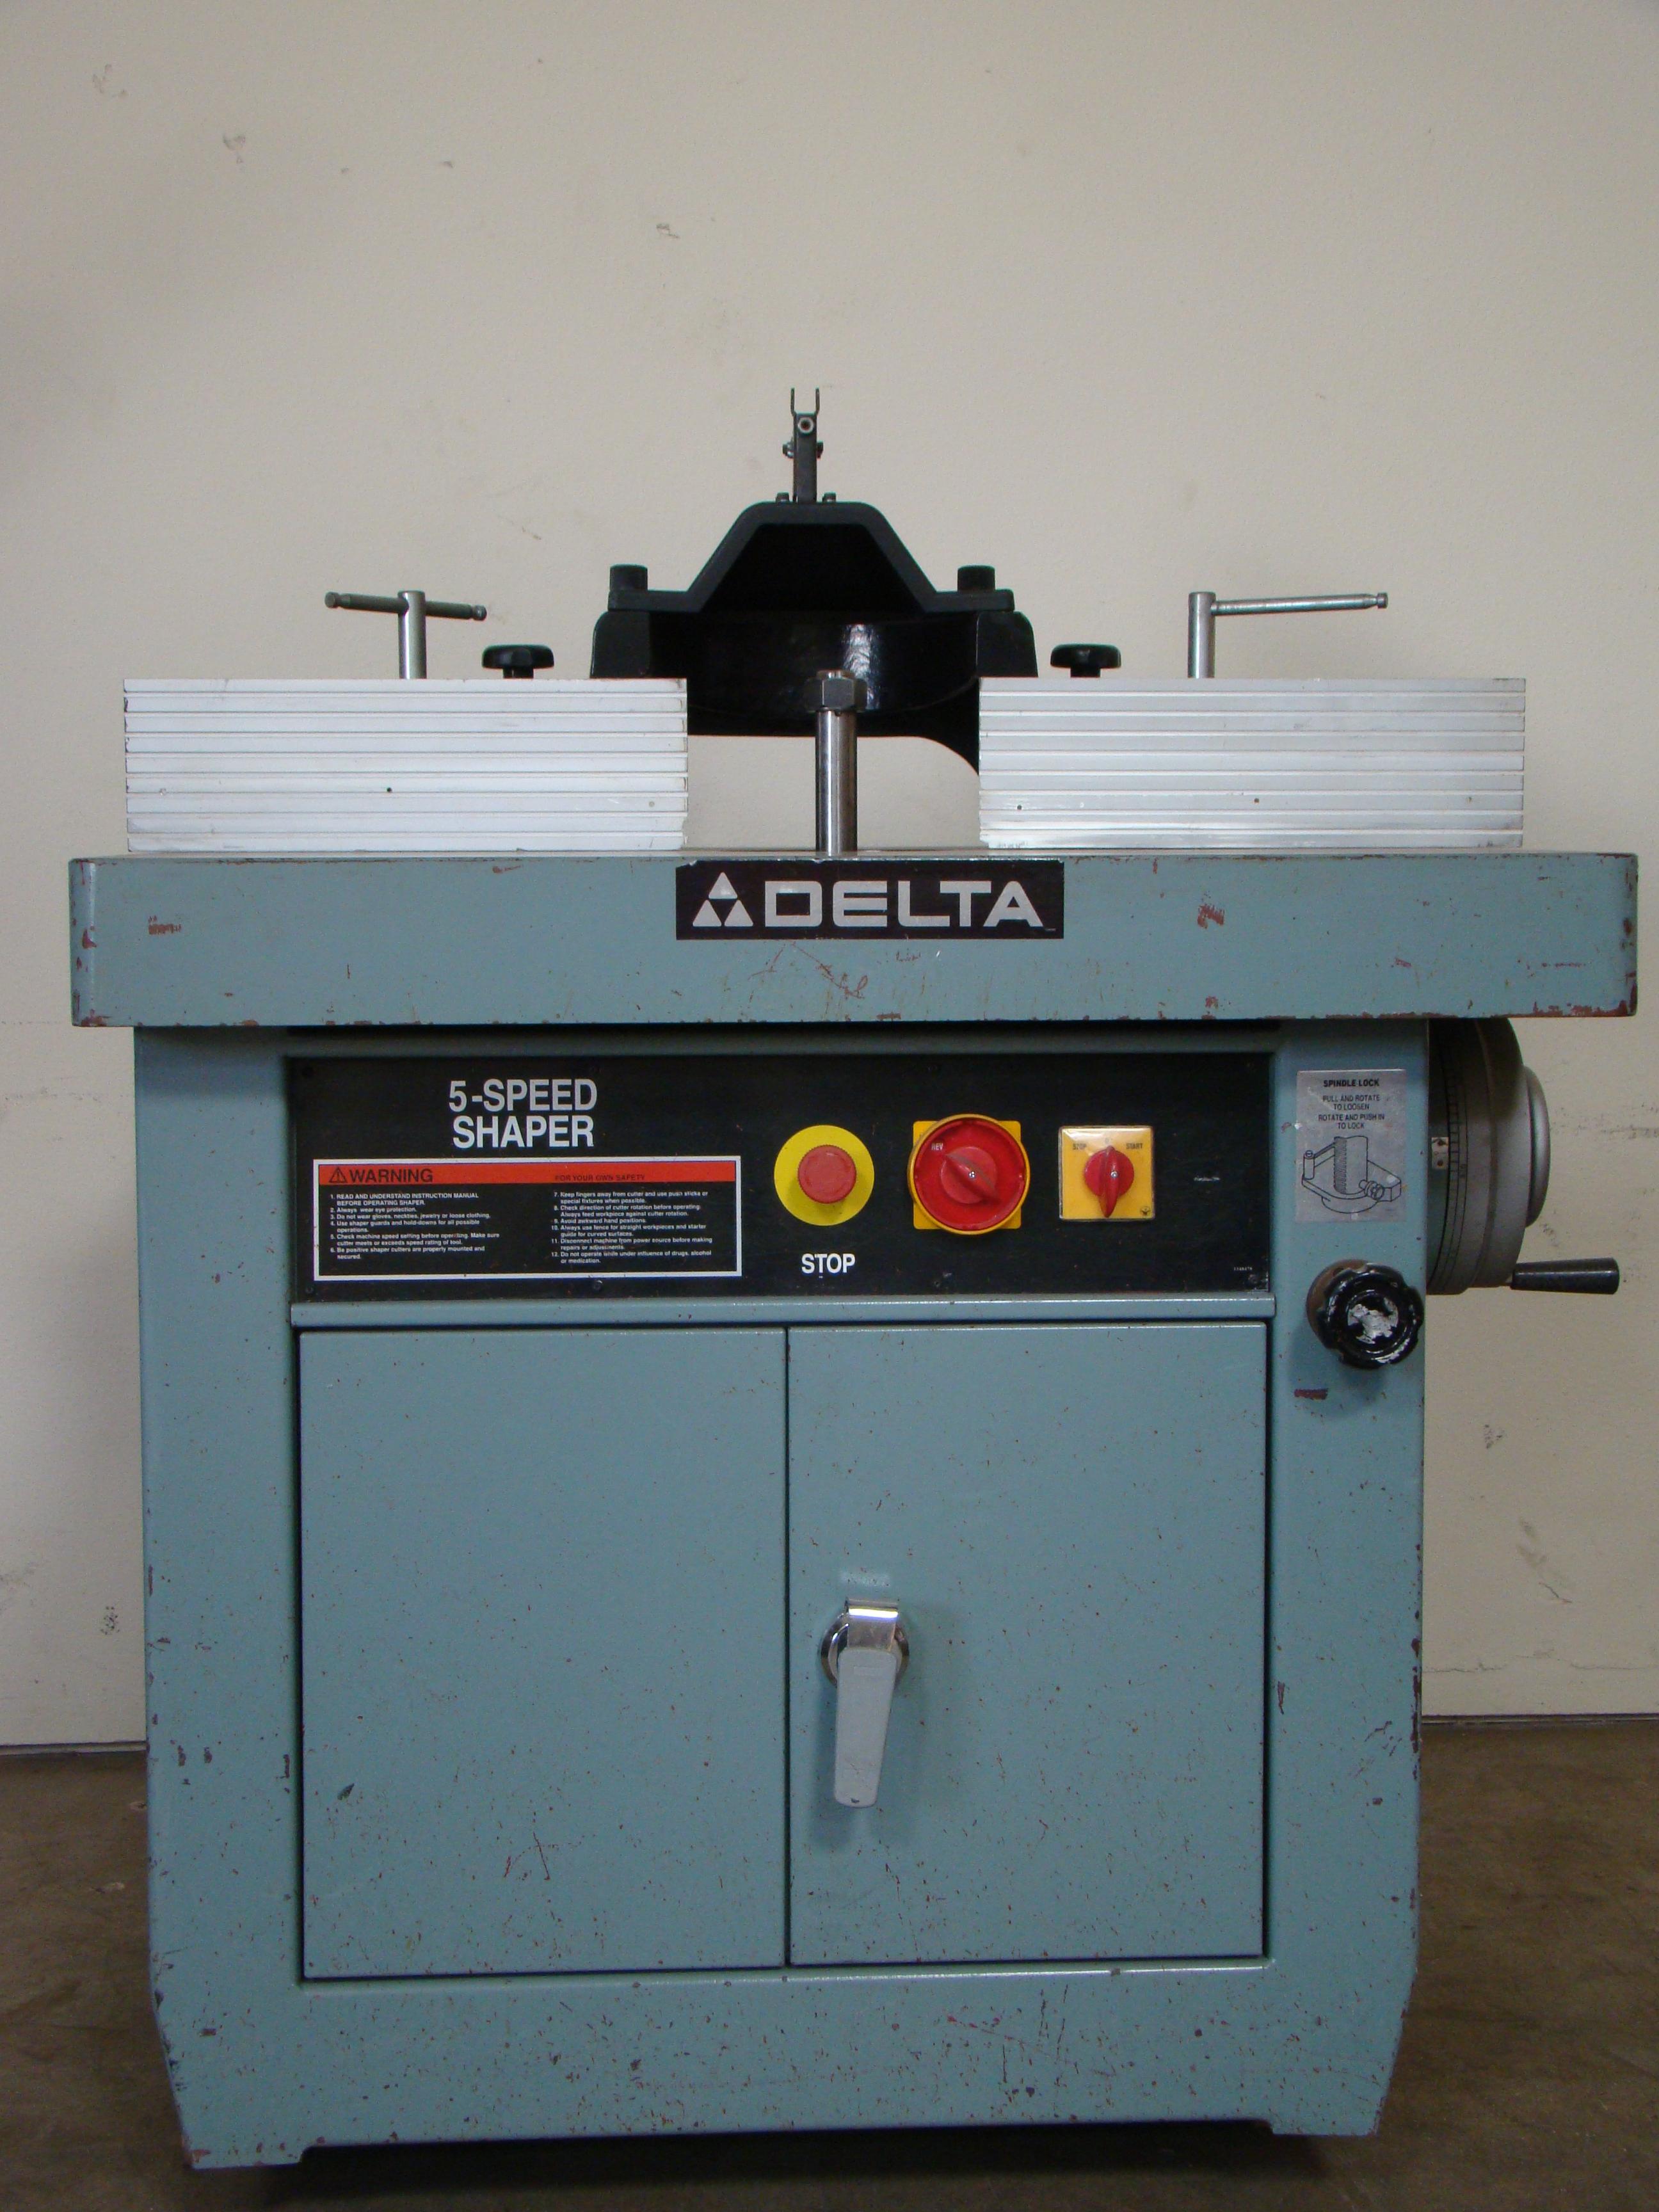 "Delta Wood Shaper 43-791 5 speed 1-1/4"" Spindle 7.5 HP 200-220/440 Volt 3PH"